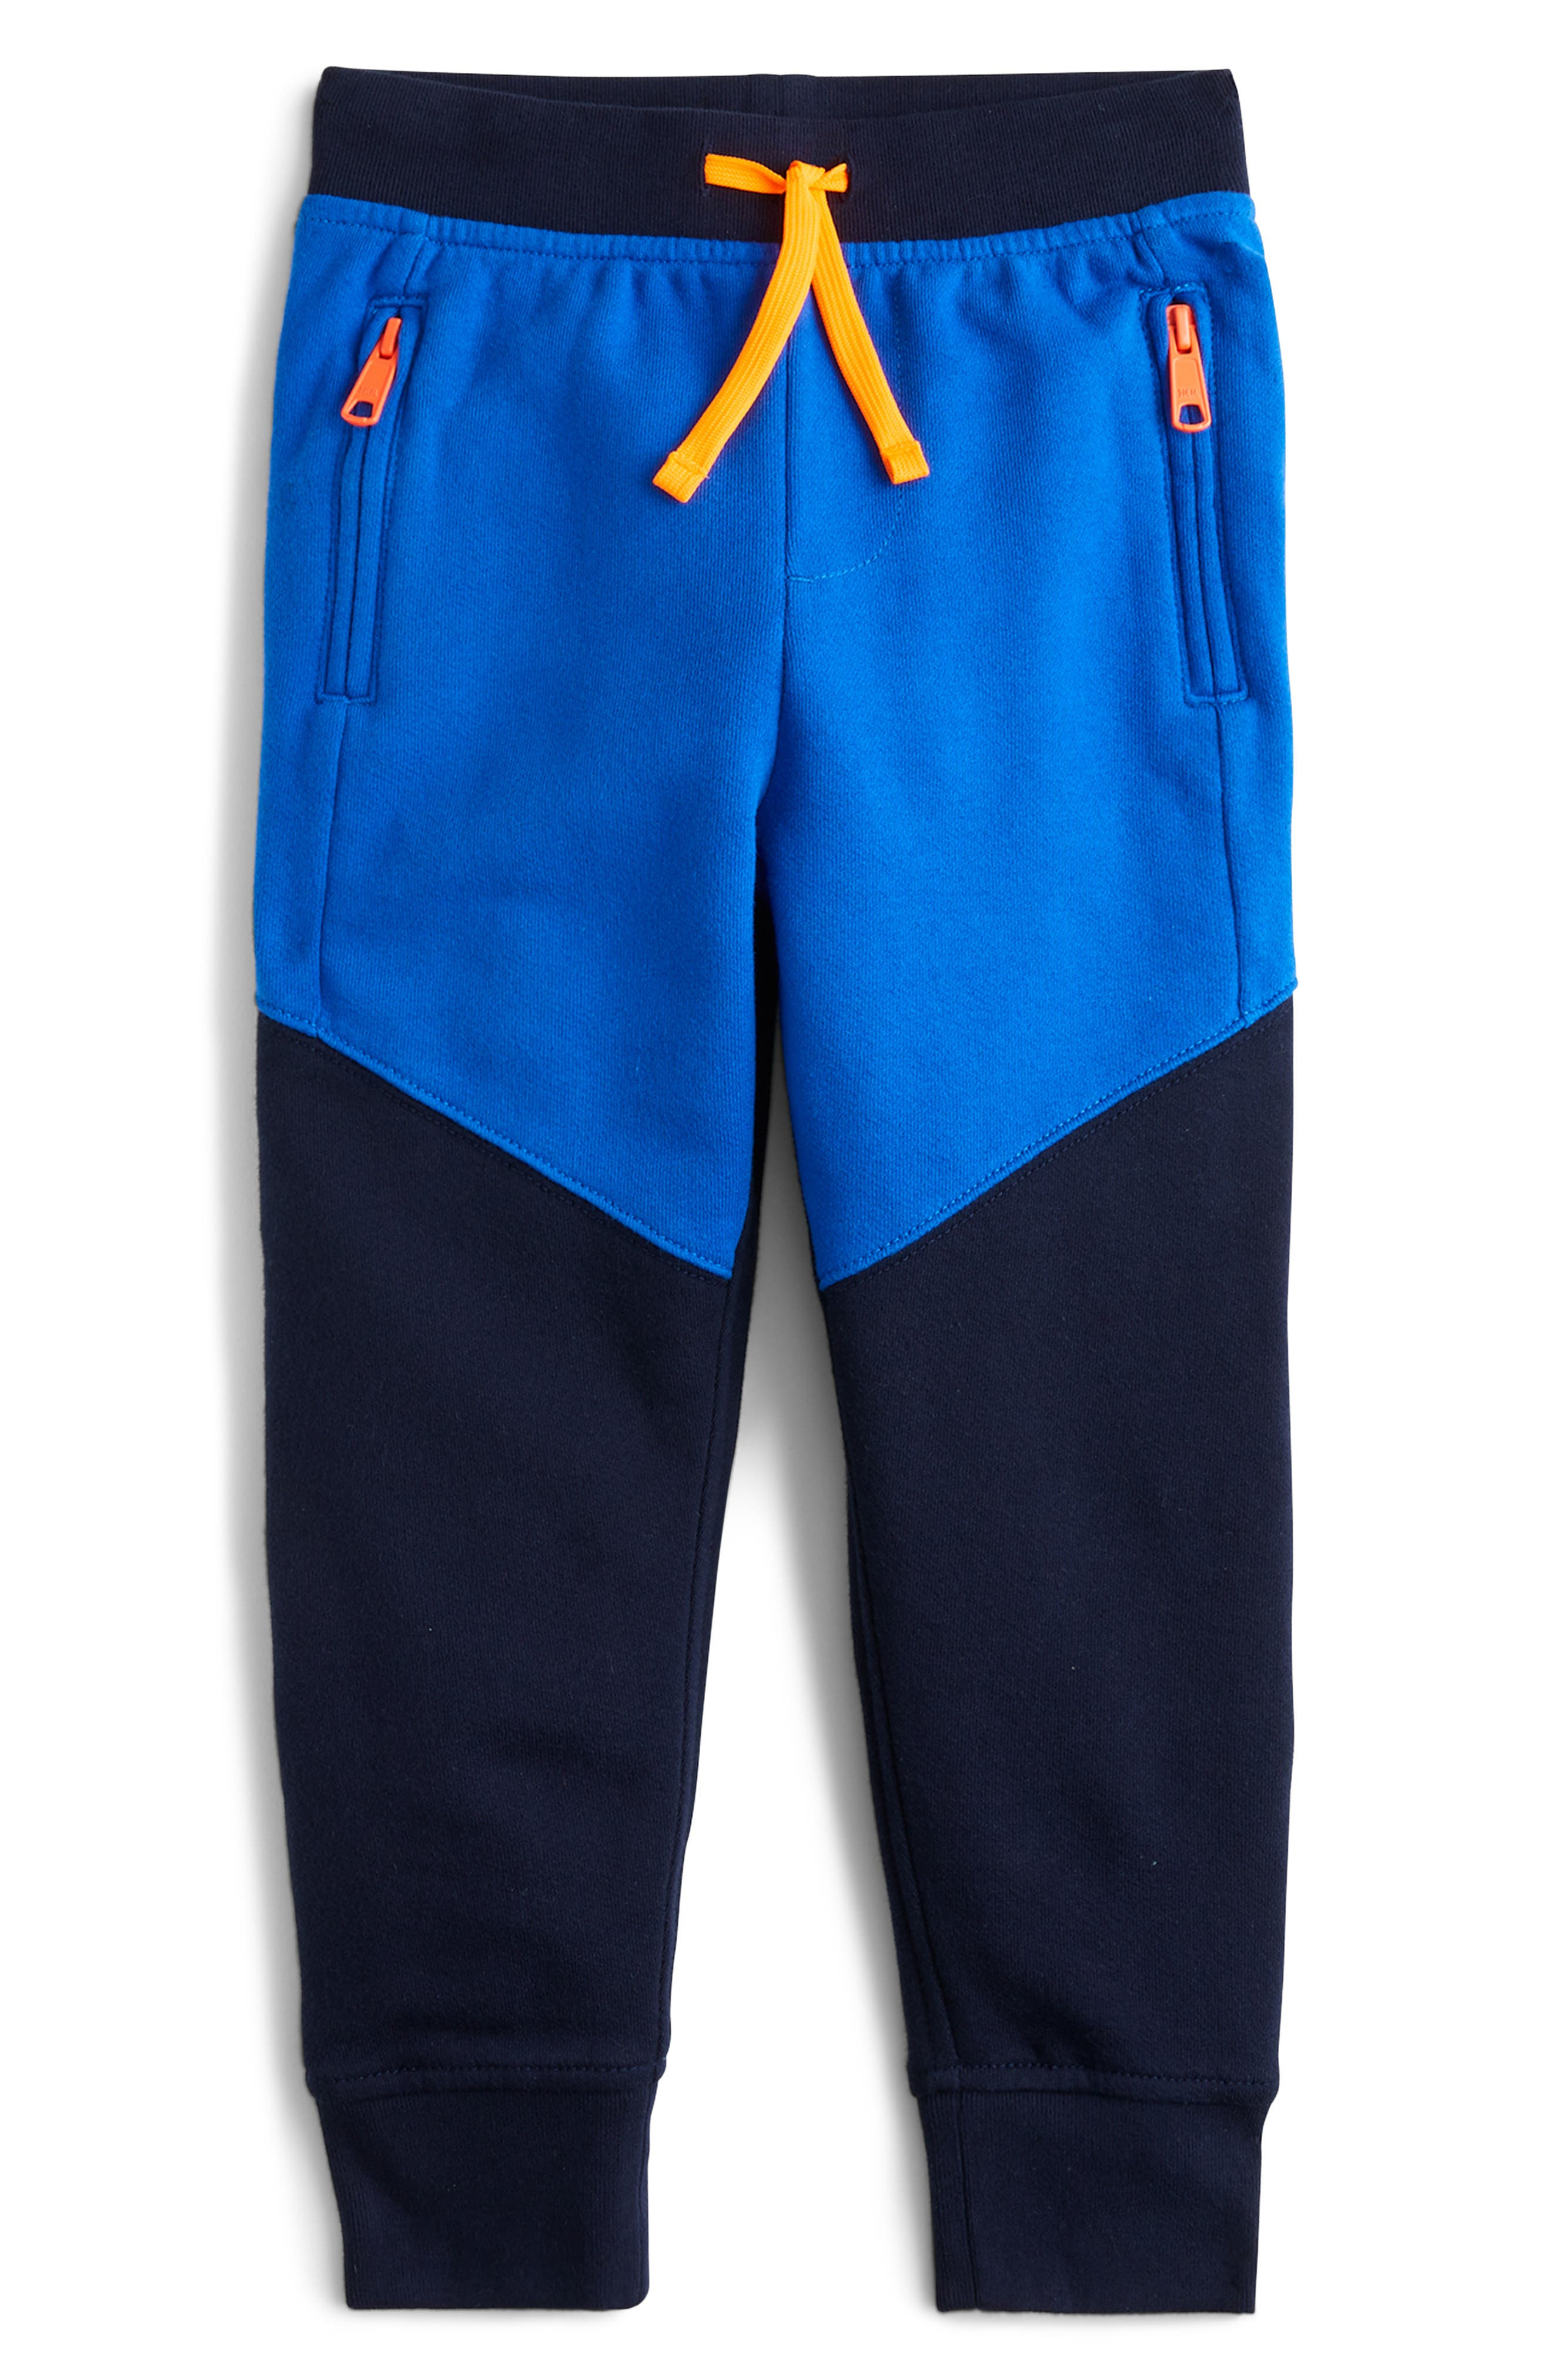 Boys Crewcuts By Jcrew Colorblock Sweatpants Size 16  Blue